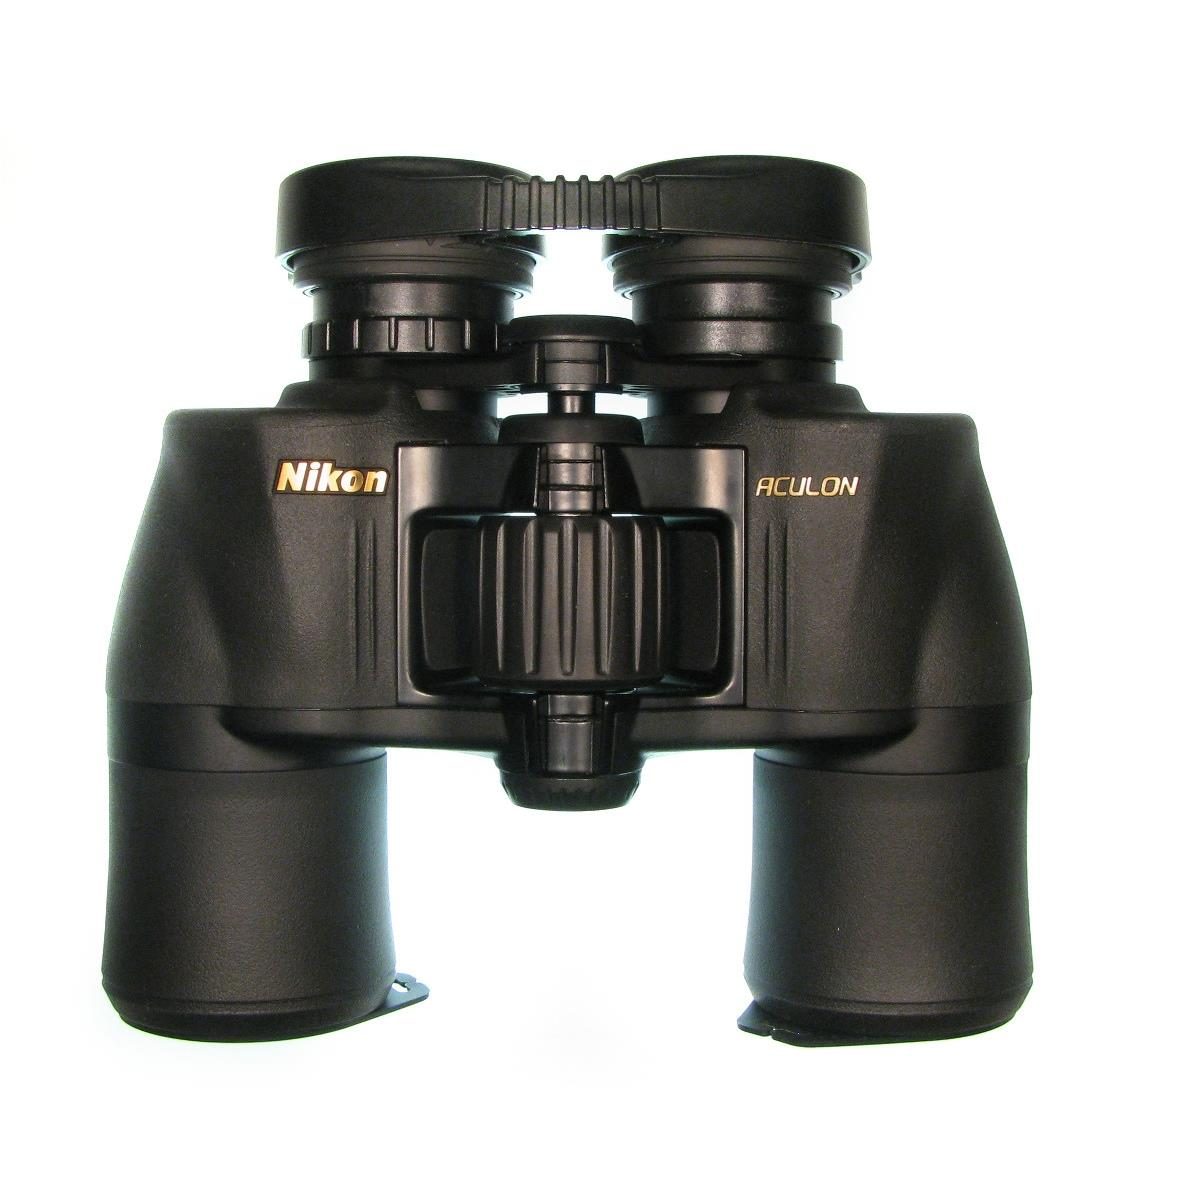 Binoculares Nikon 10x42 Aculon A211